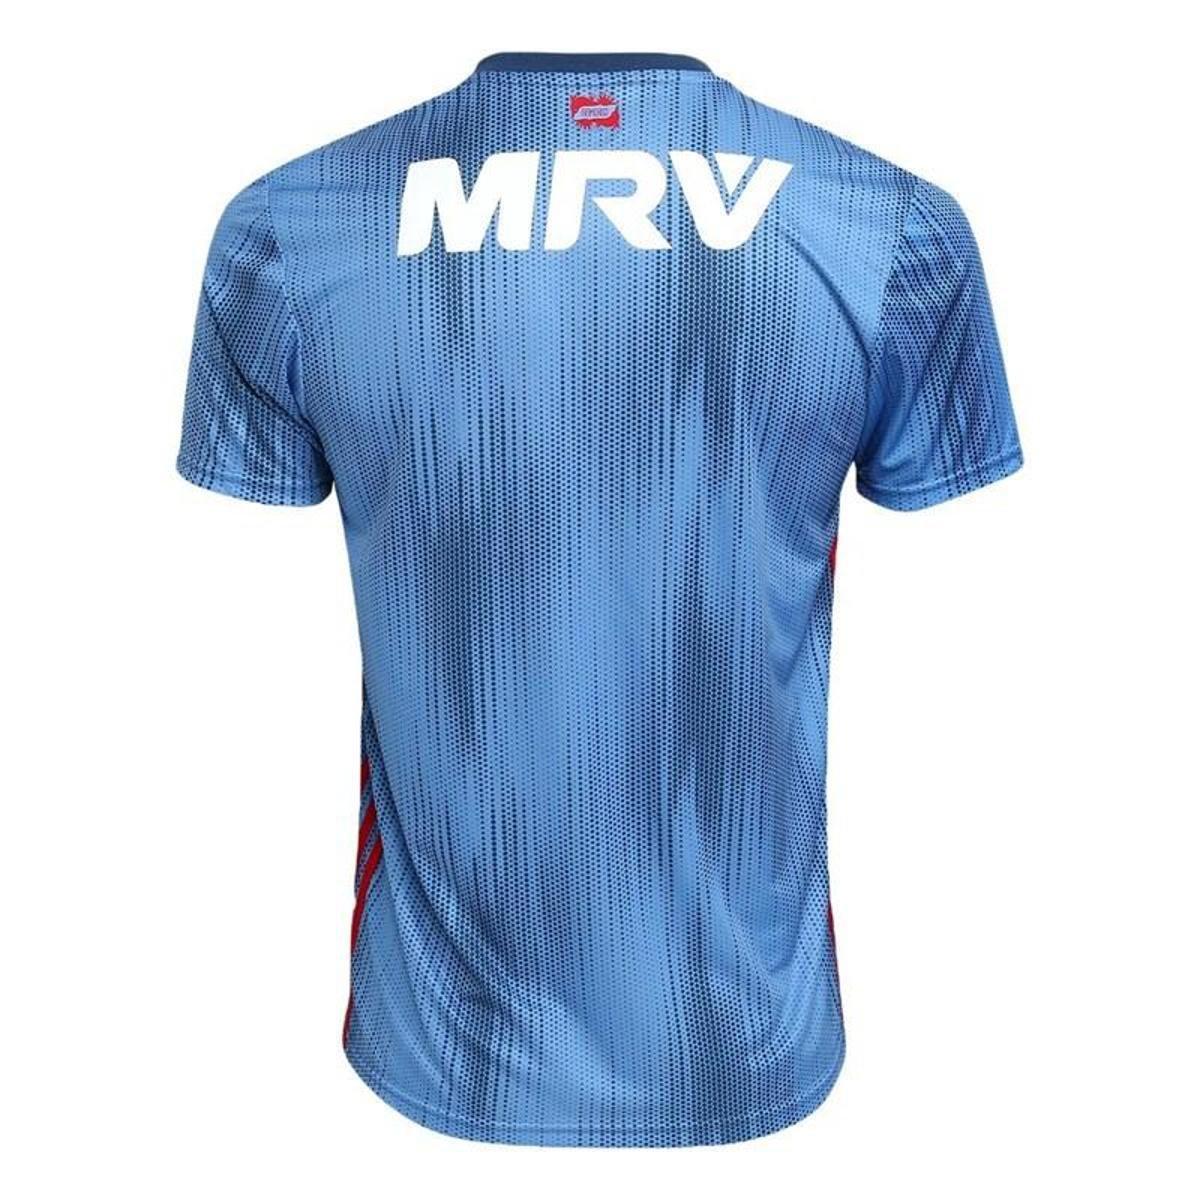 Camisa Flamengo III 2018 s n° - Torcedor Adidas Masculina - Azul ... a2f12bd4d8bea